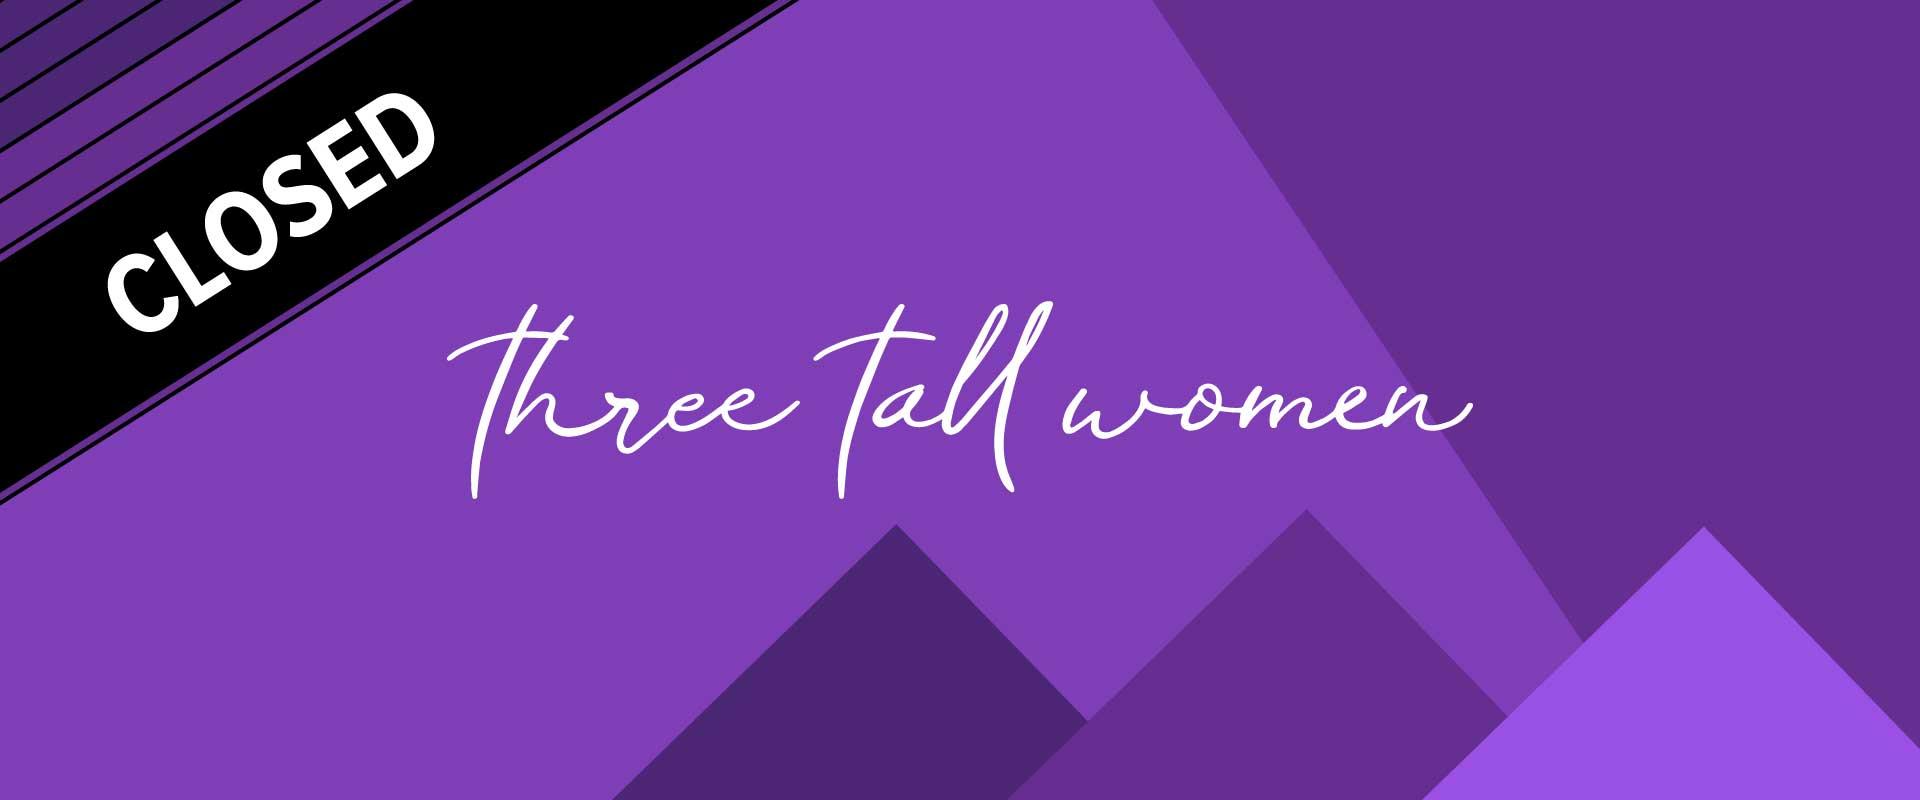 Wordmark image of Edward Albee's Three Tall Women - Closed.